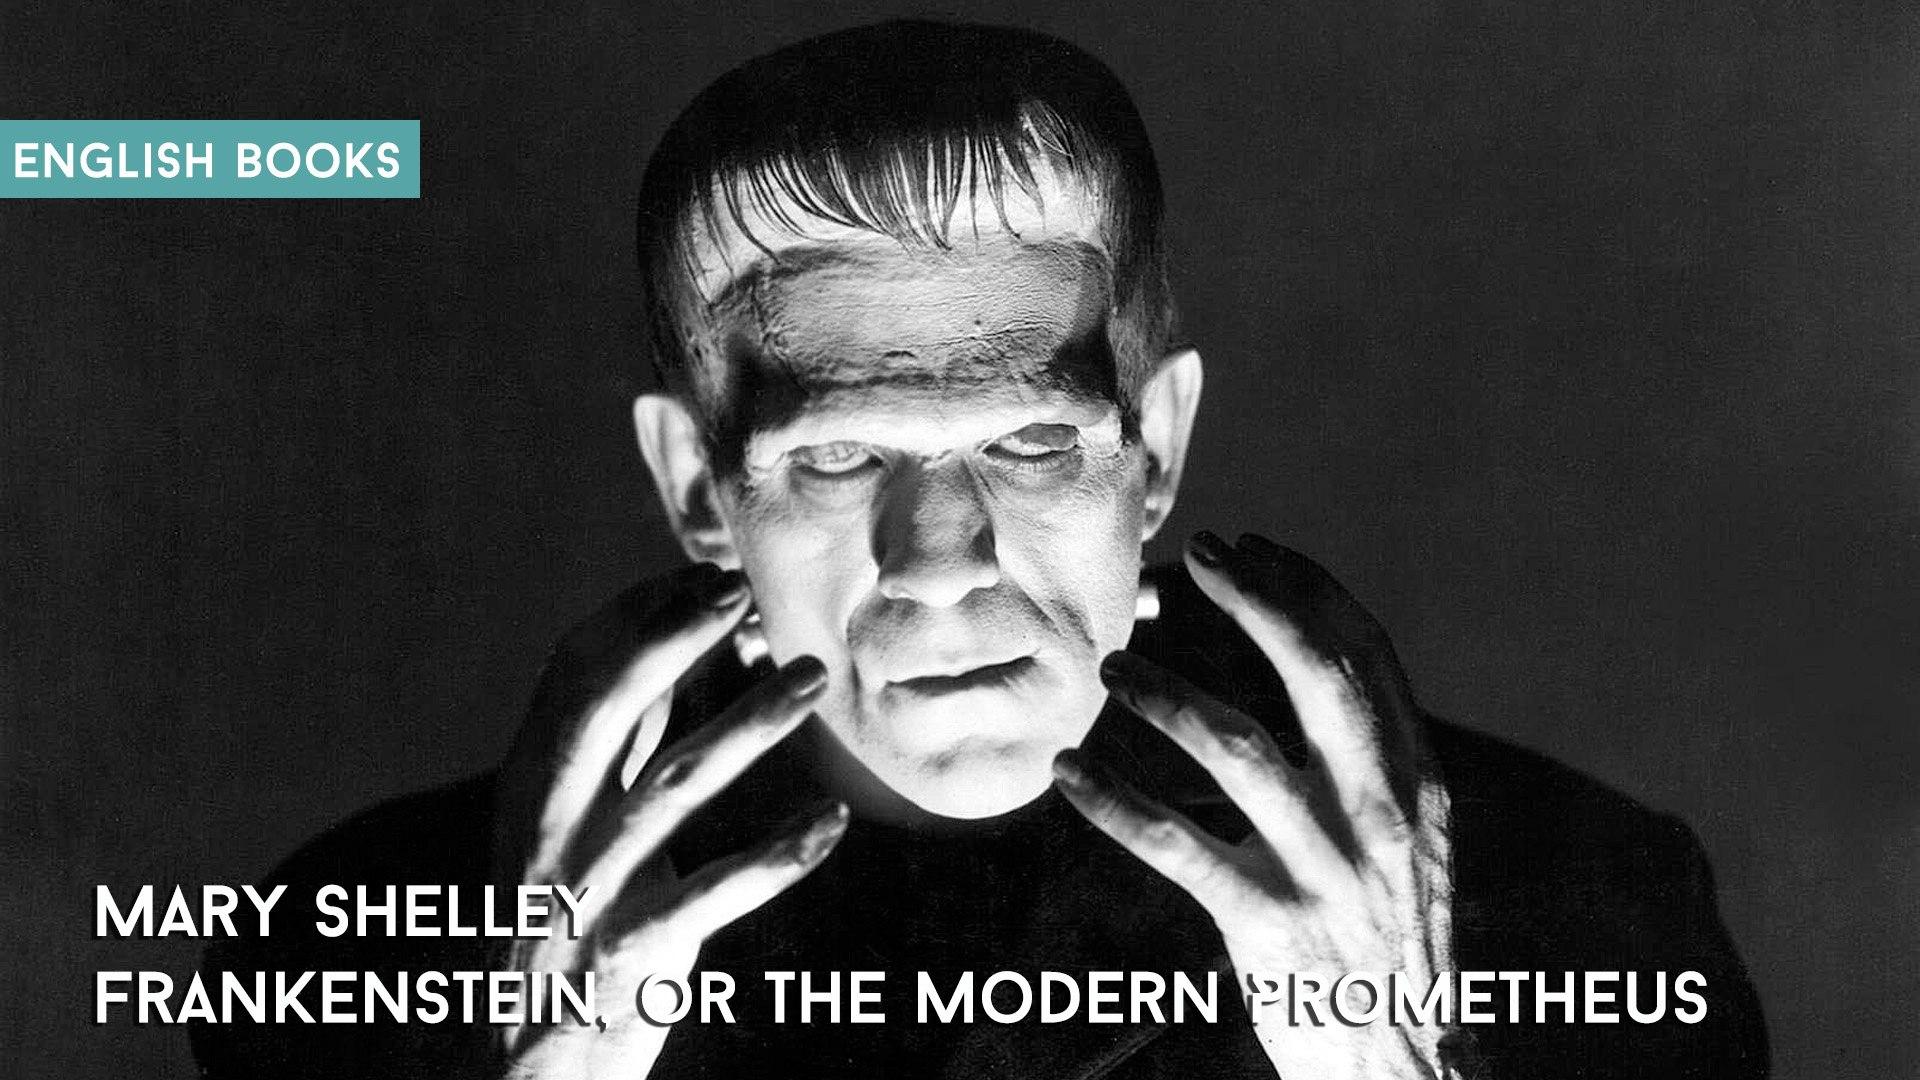 Mary Shelley — Frankenstein, Or The Modern Prometheus